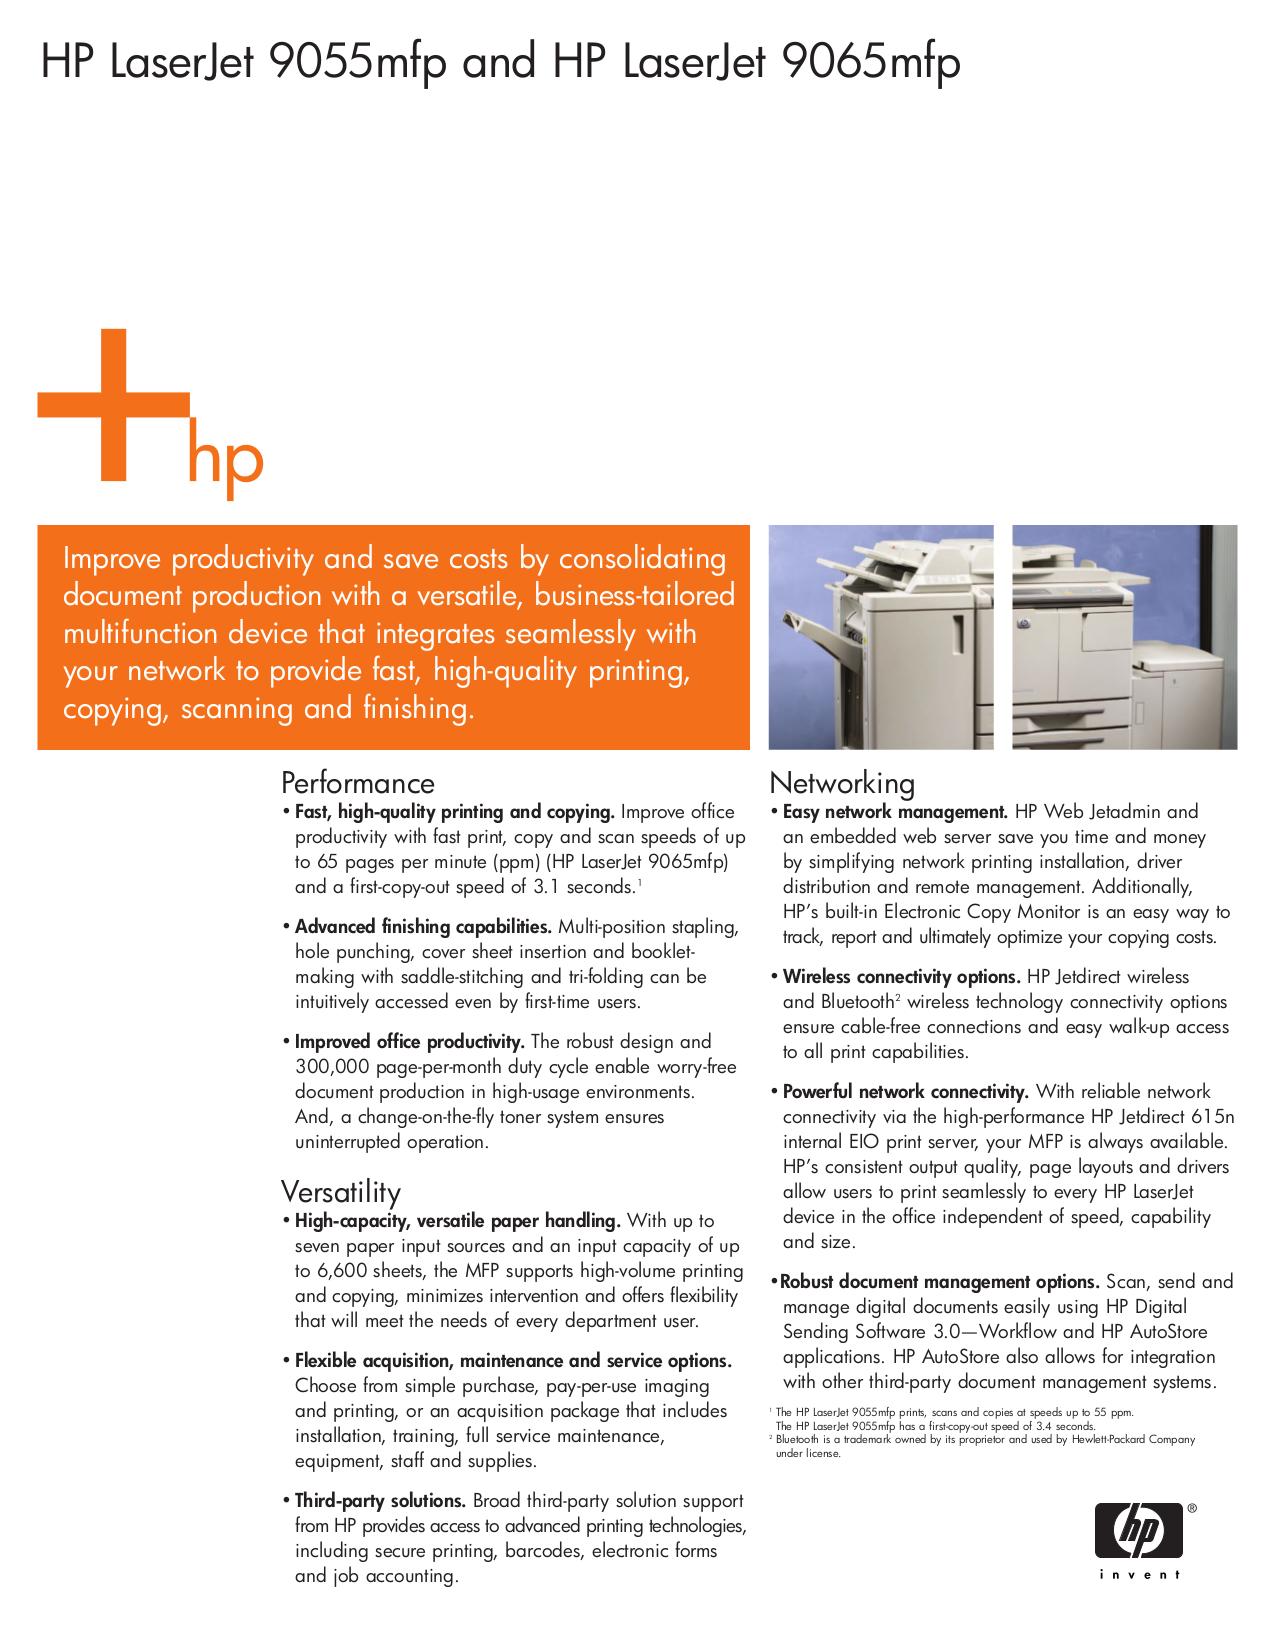 pdf for HP Multifunction Printer Laserjet,Color Laserjet 9055 MFP manual